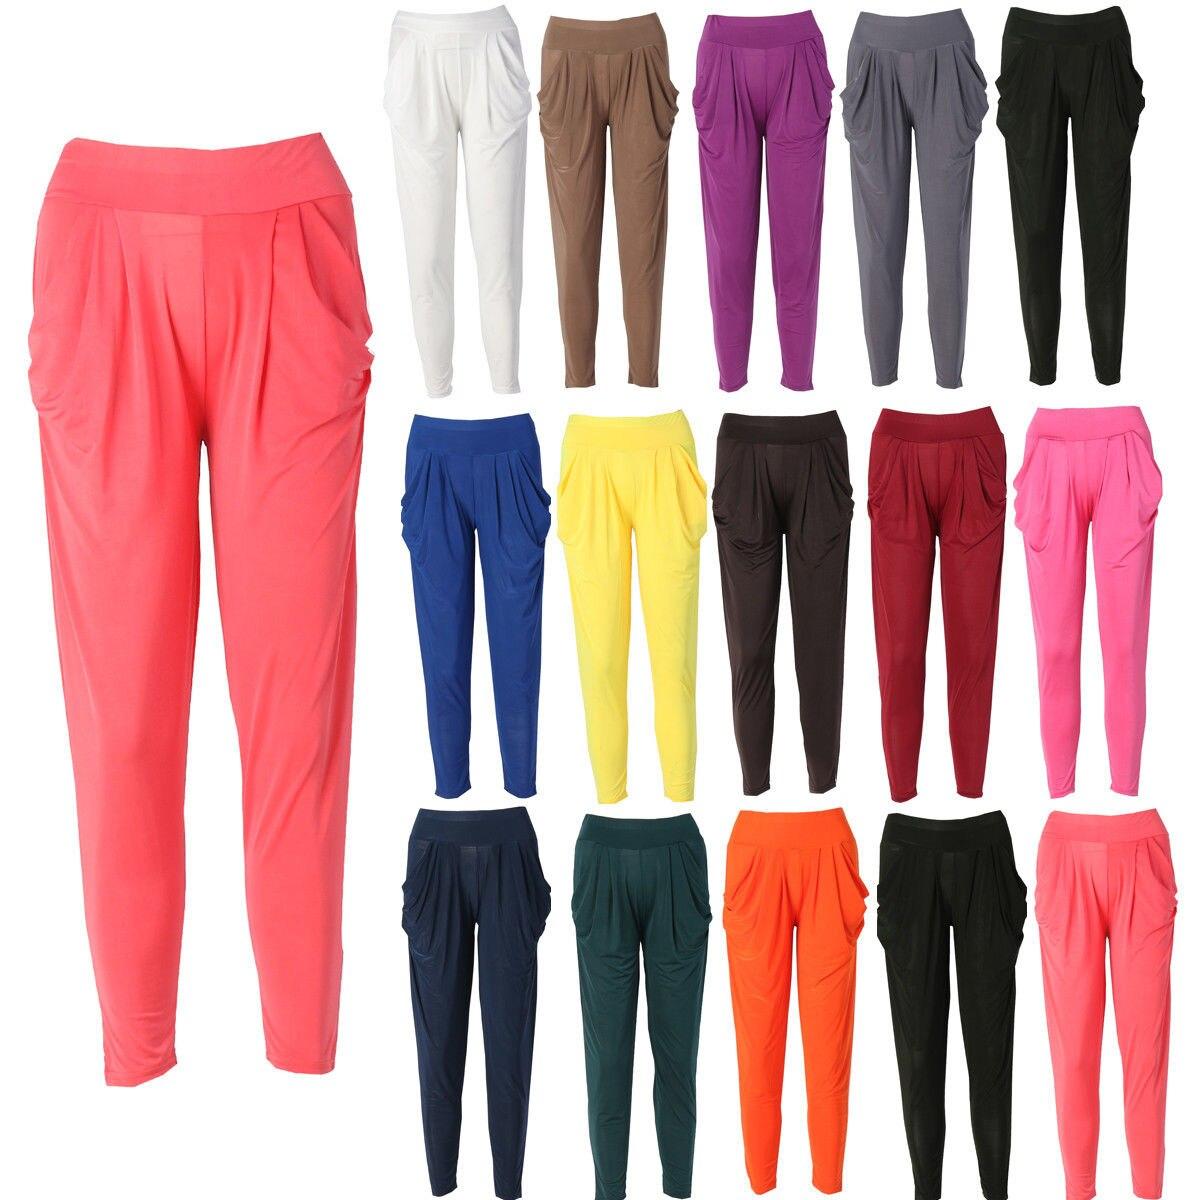 Hot Sale Summer Women Slim Casual Harem Pants Solid High Waist Long Pant Trousers Women Clothing